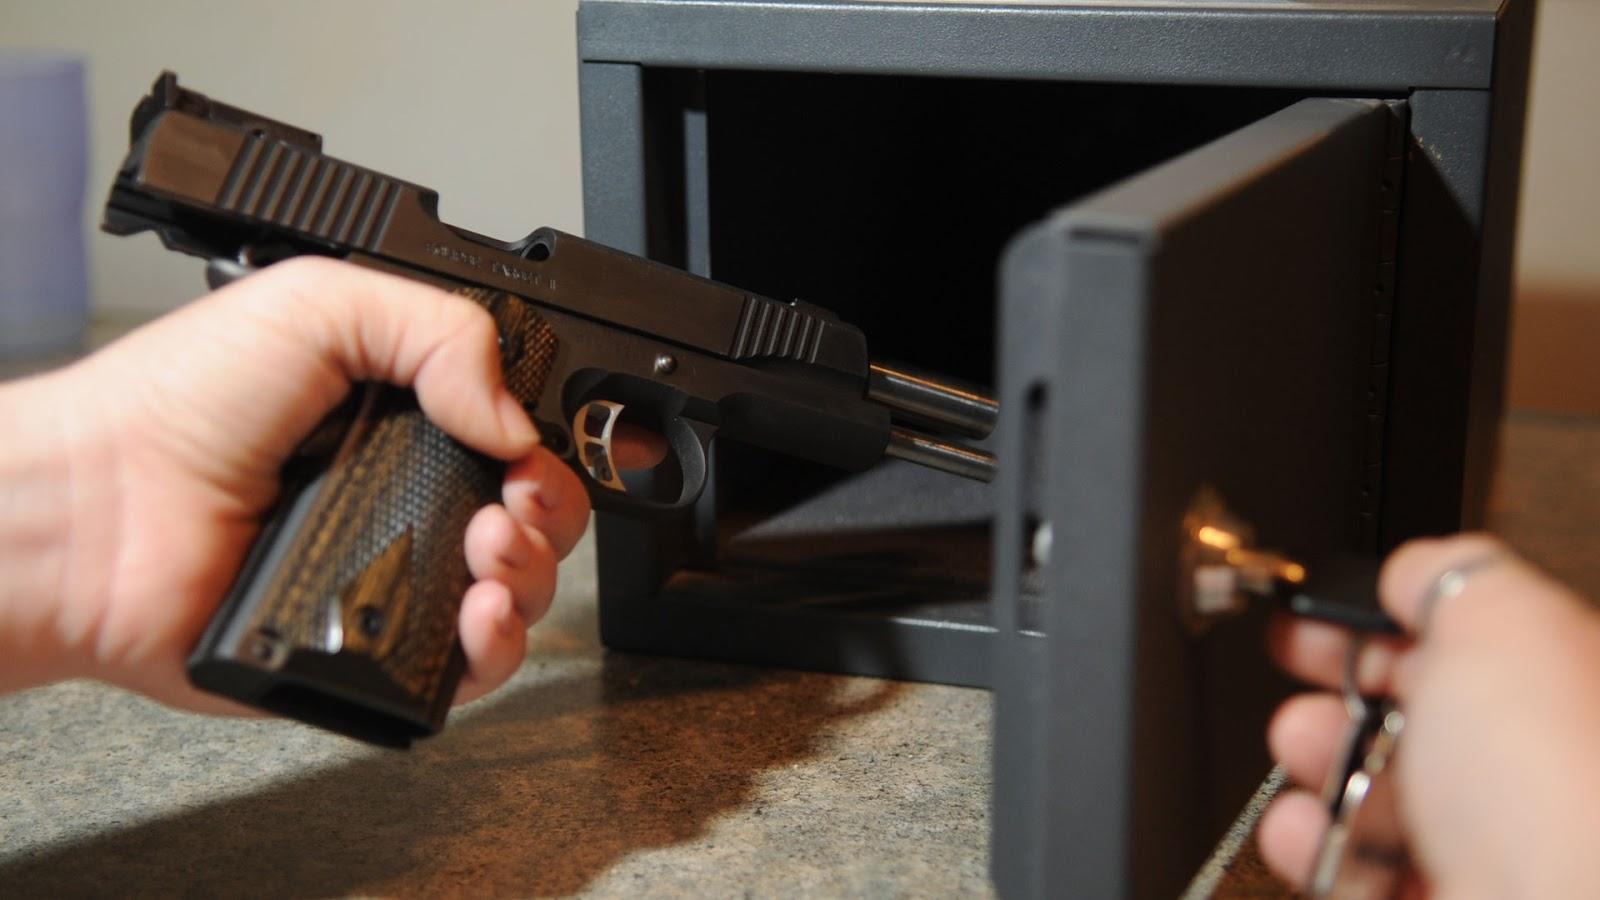 man locking pistol in safe